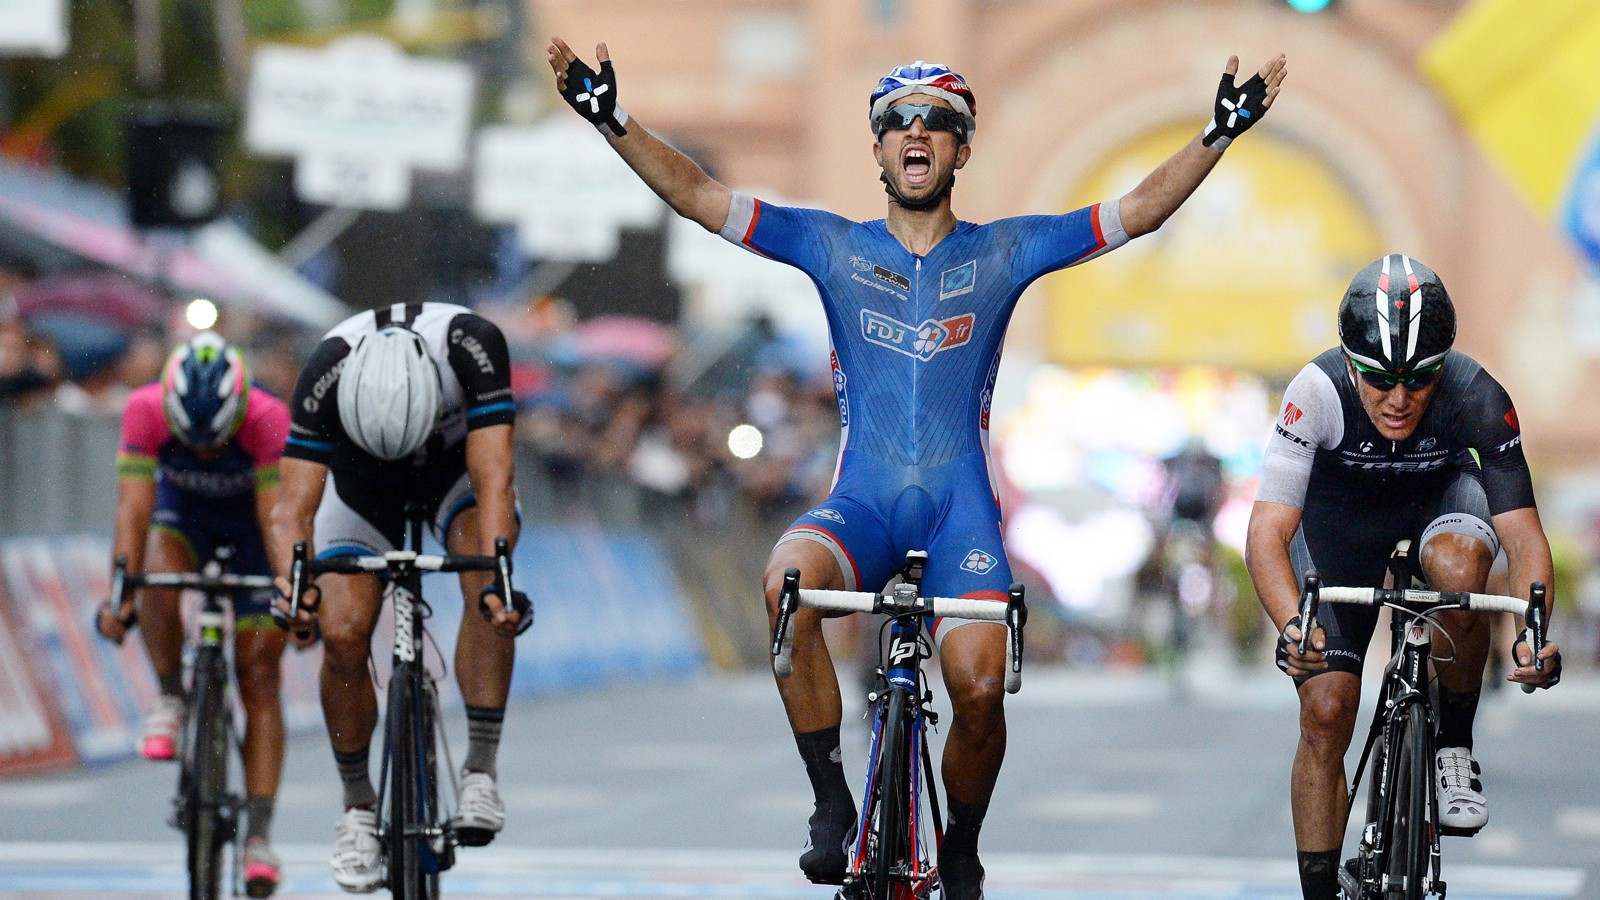 Nacer Bouhanni won stage 4 of the 2014 Giro d'Italia